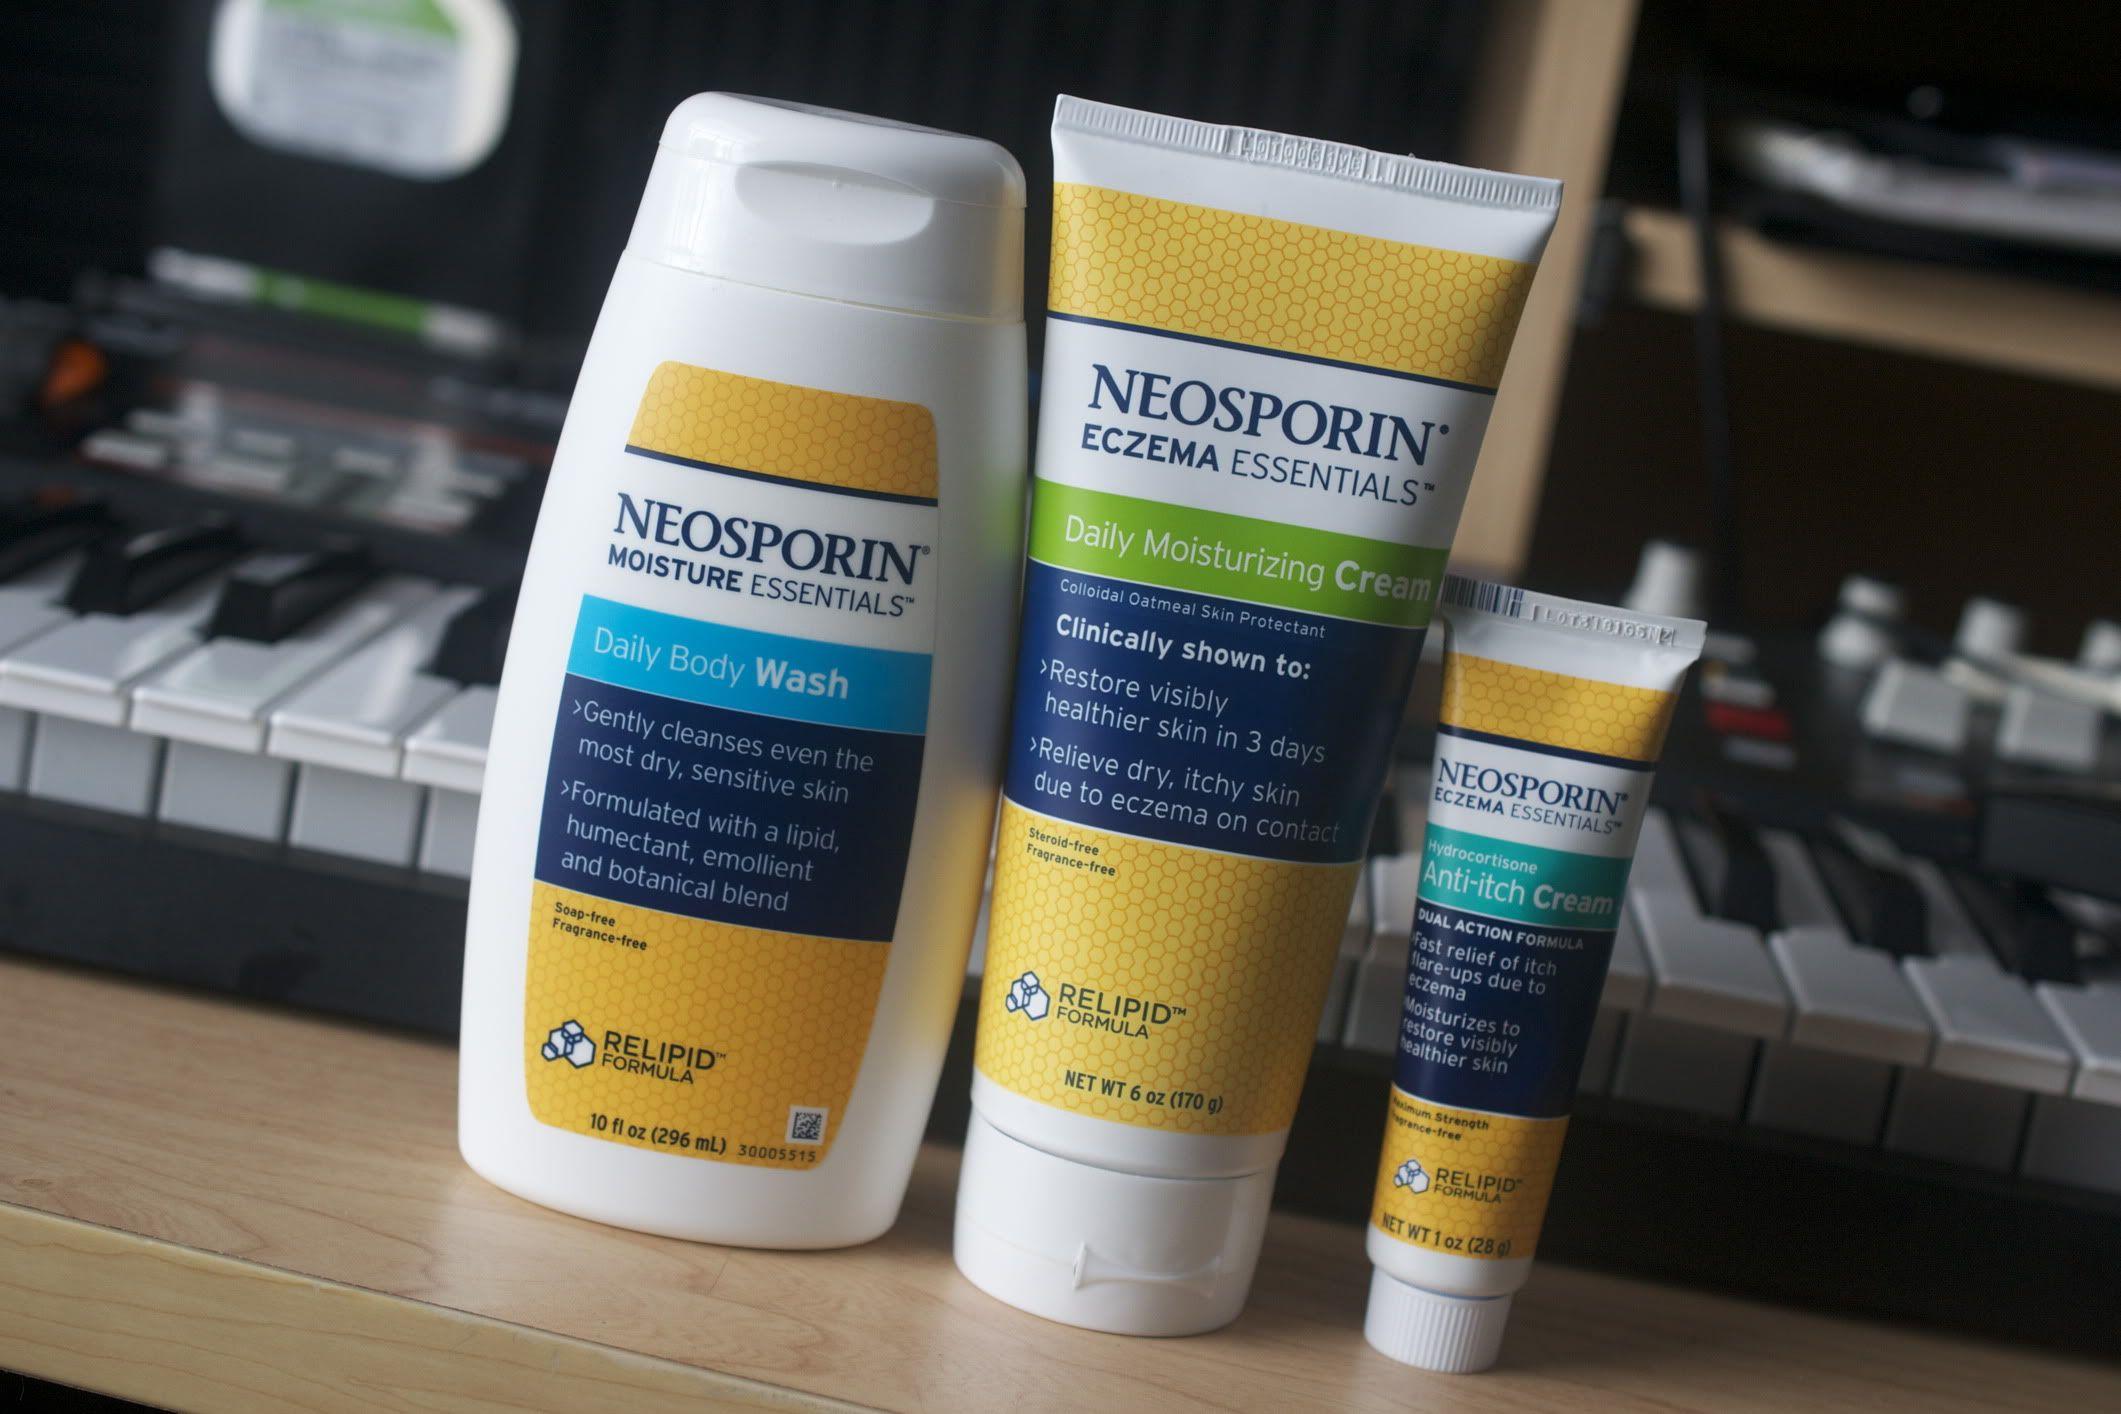 Got eczema? These products work! Neosporin Eczema Essentials review